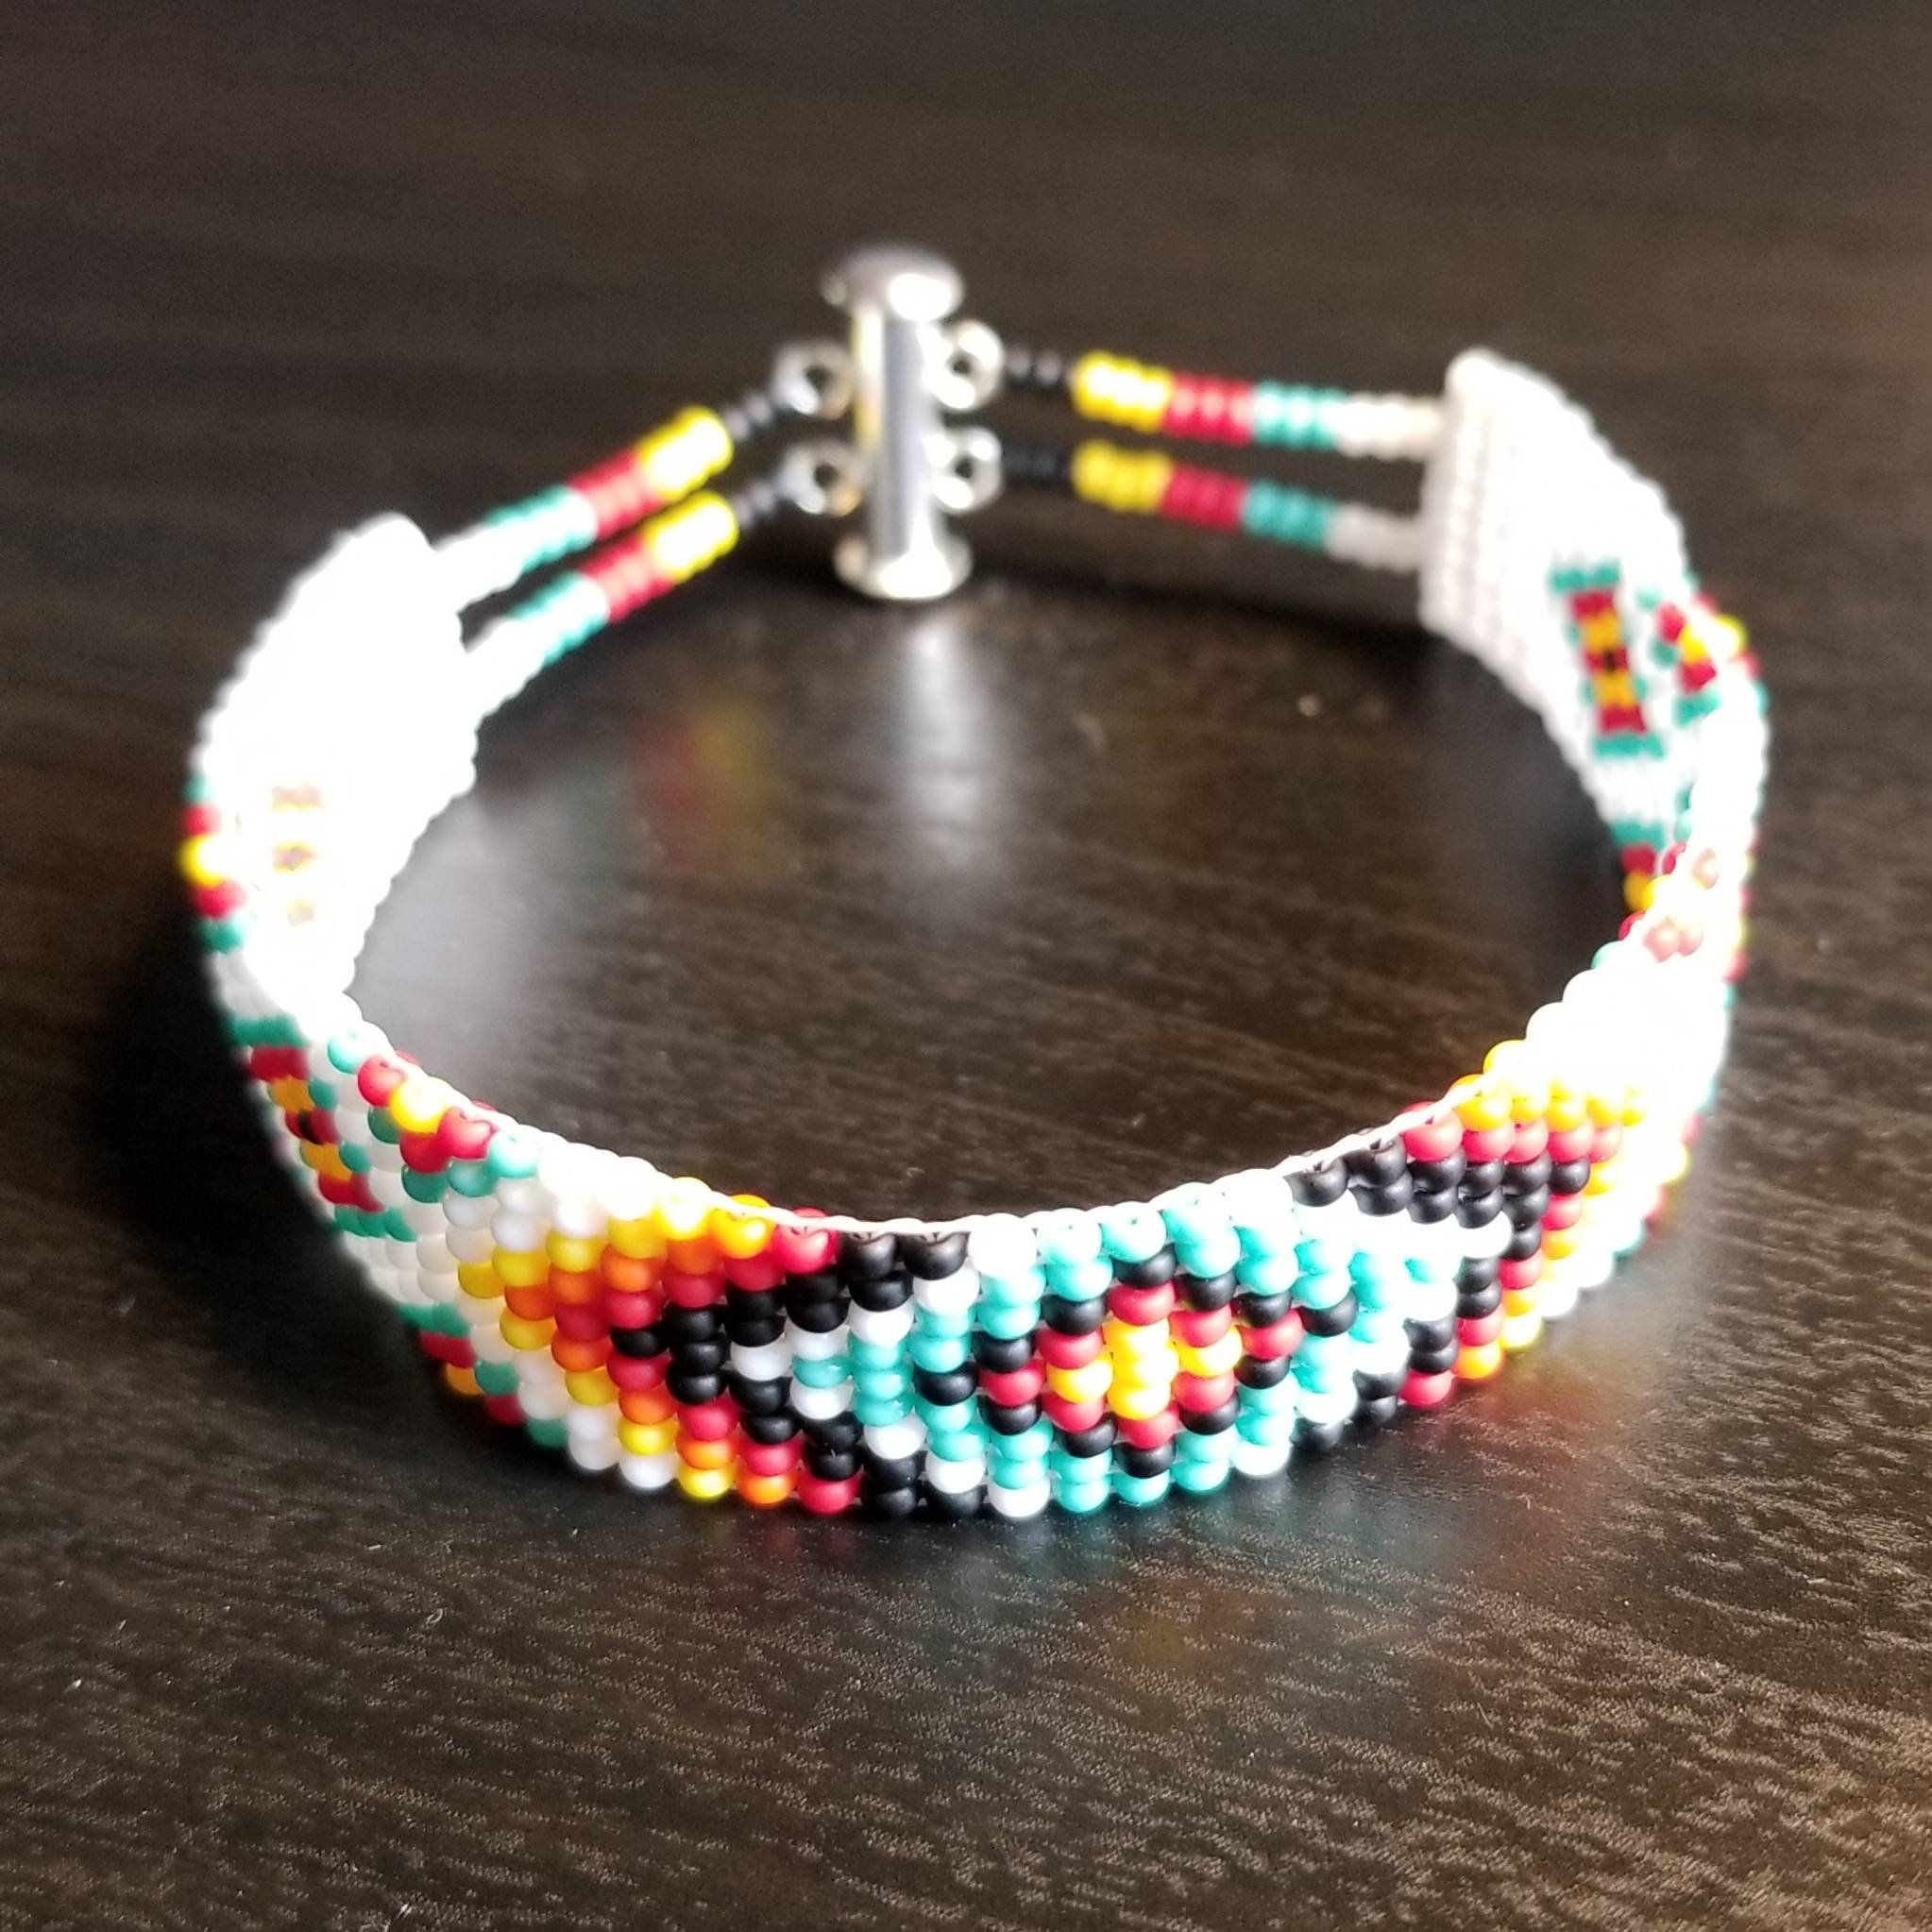 Indian Beading Loom Friendship Bracelet Necklace American Making Easy Kit Gift